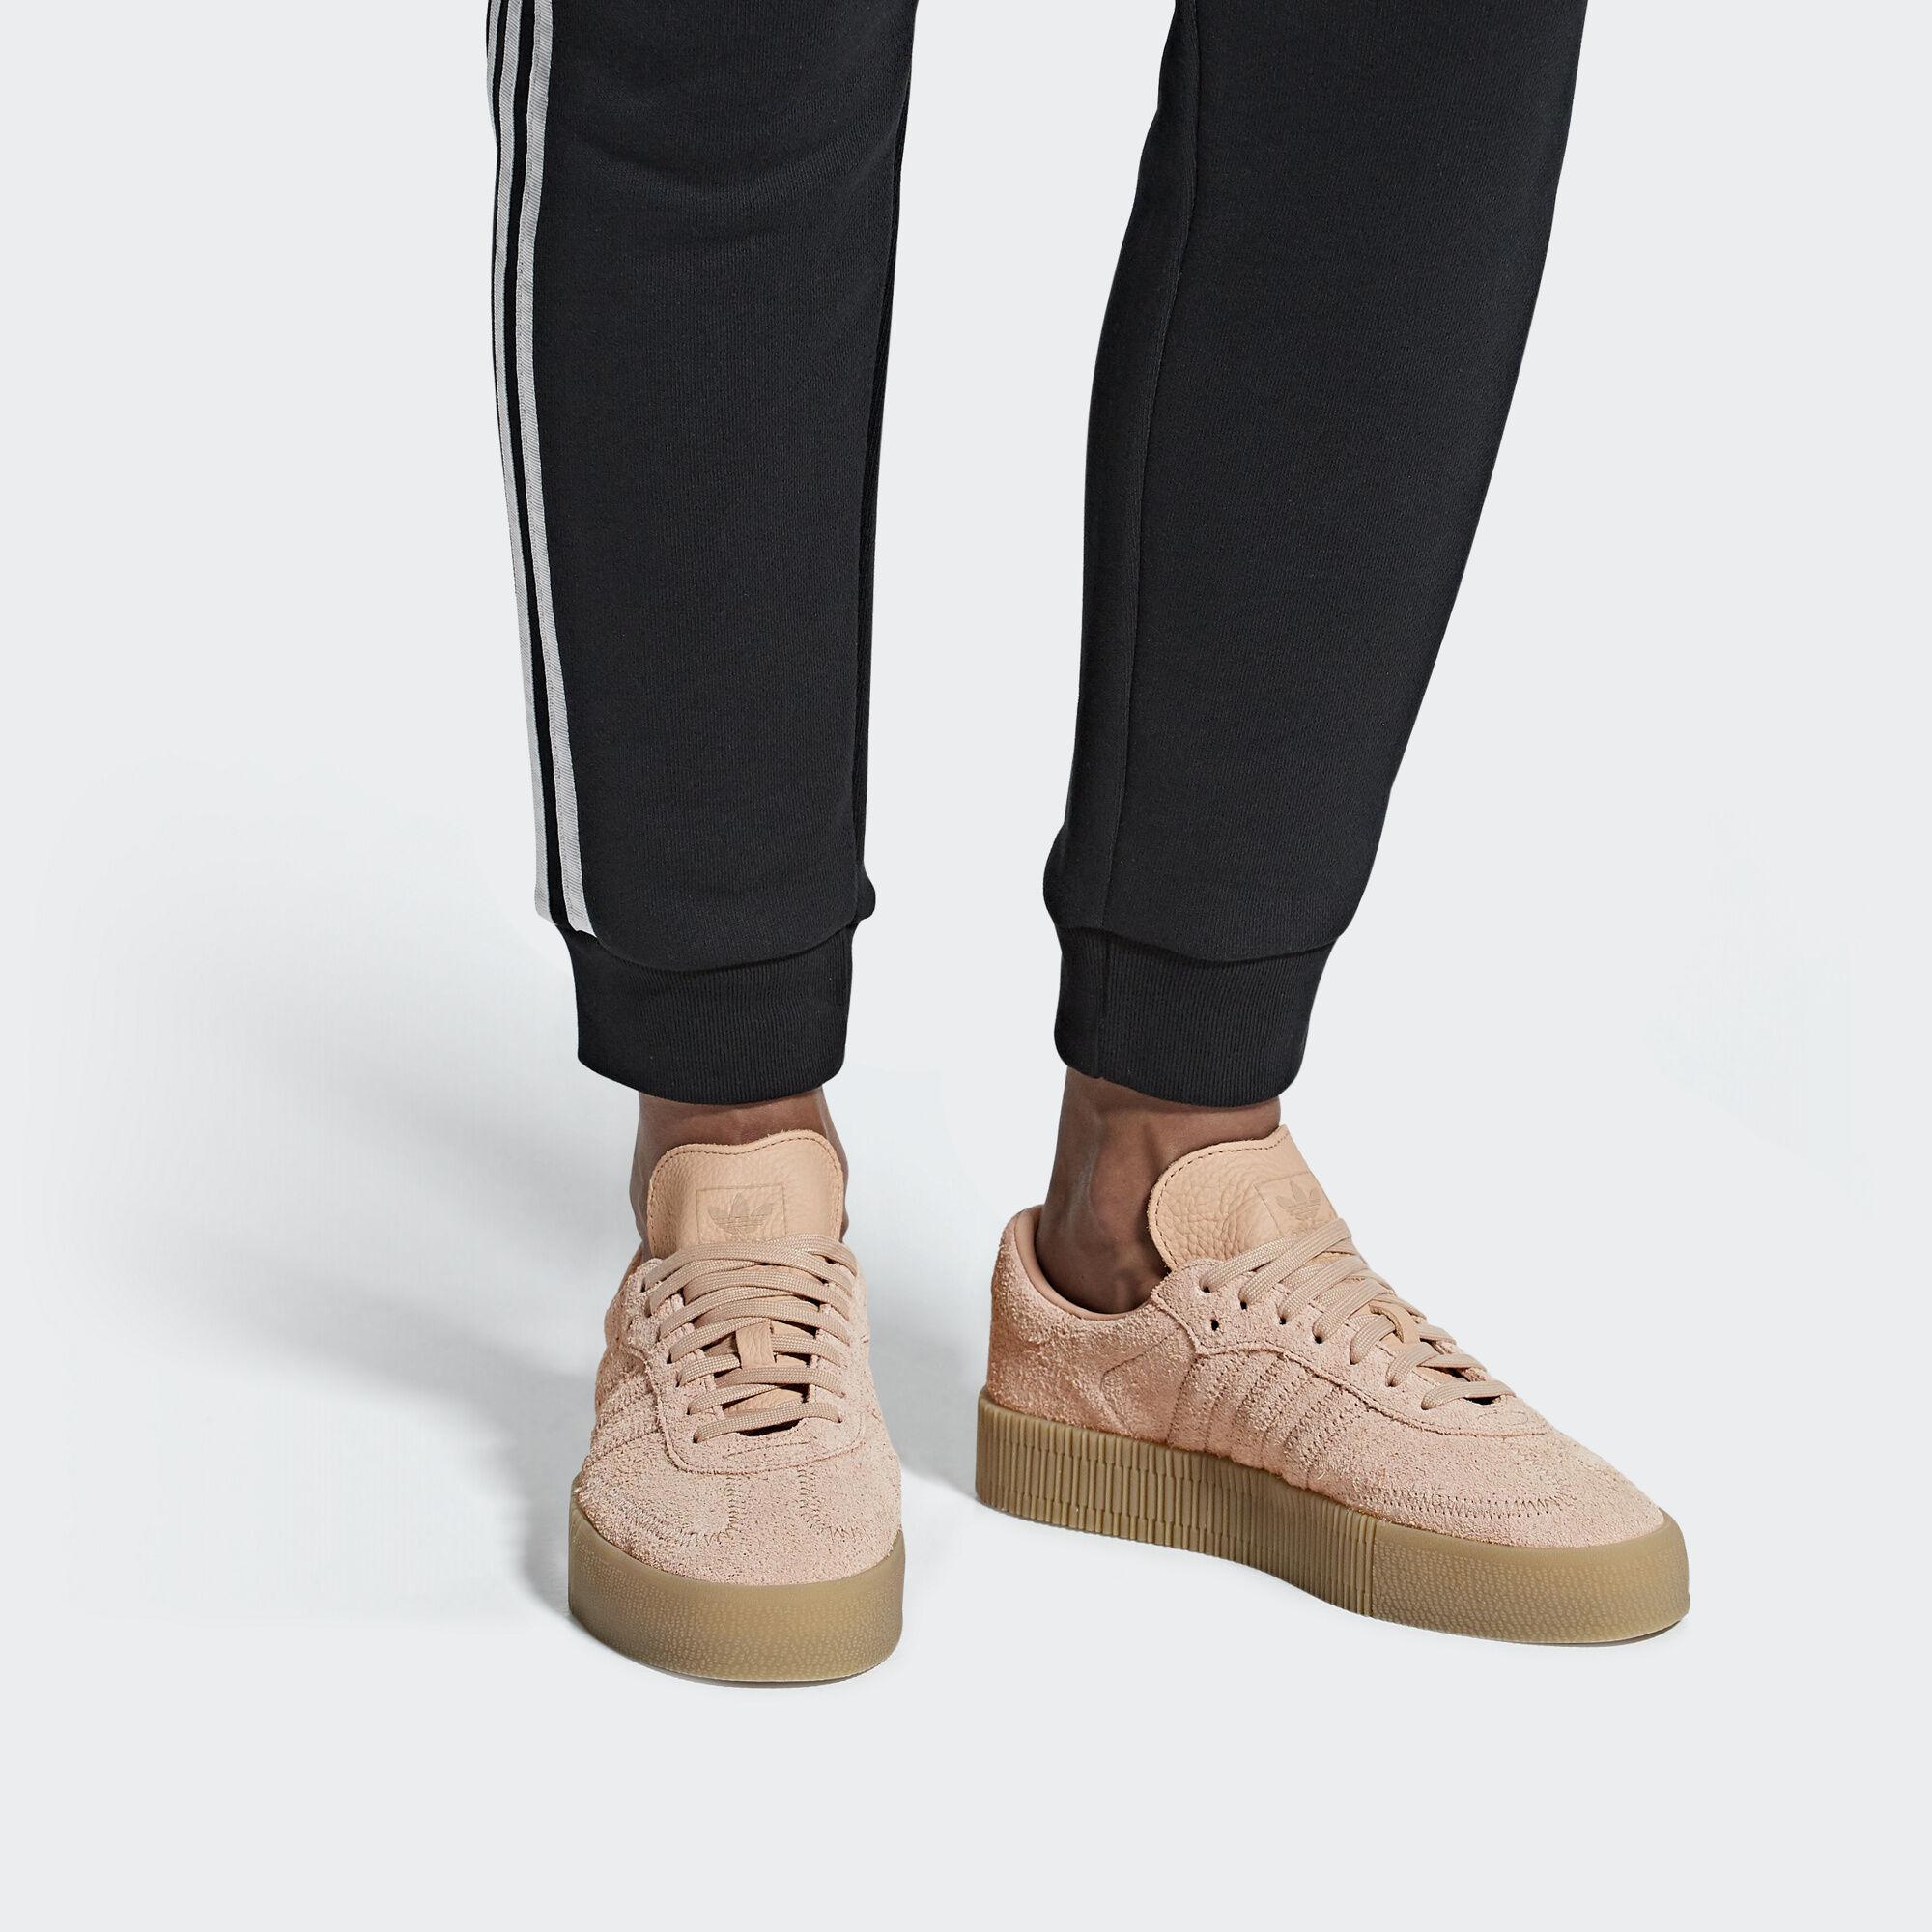 sale retailer 9b3b0 0a73a adidas SAMBAROSE Shoes - Green  adidas Finland